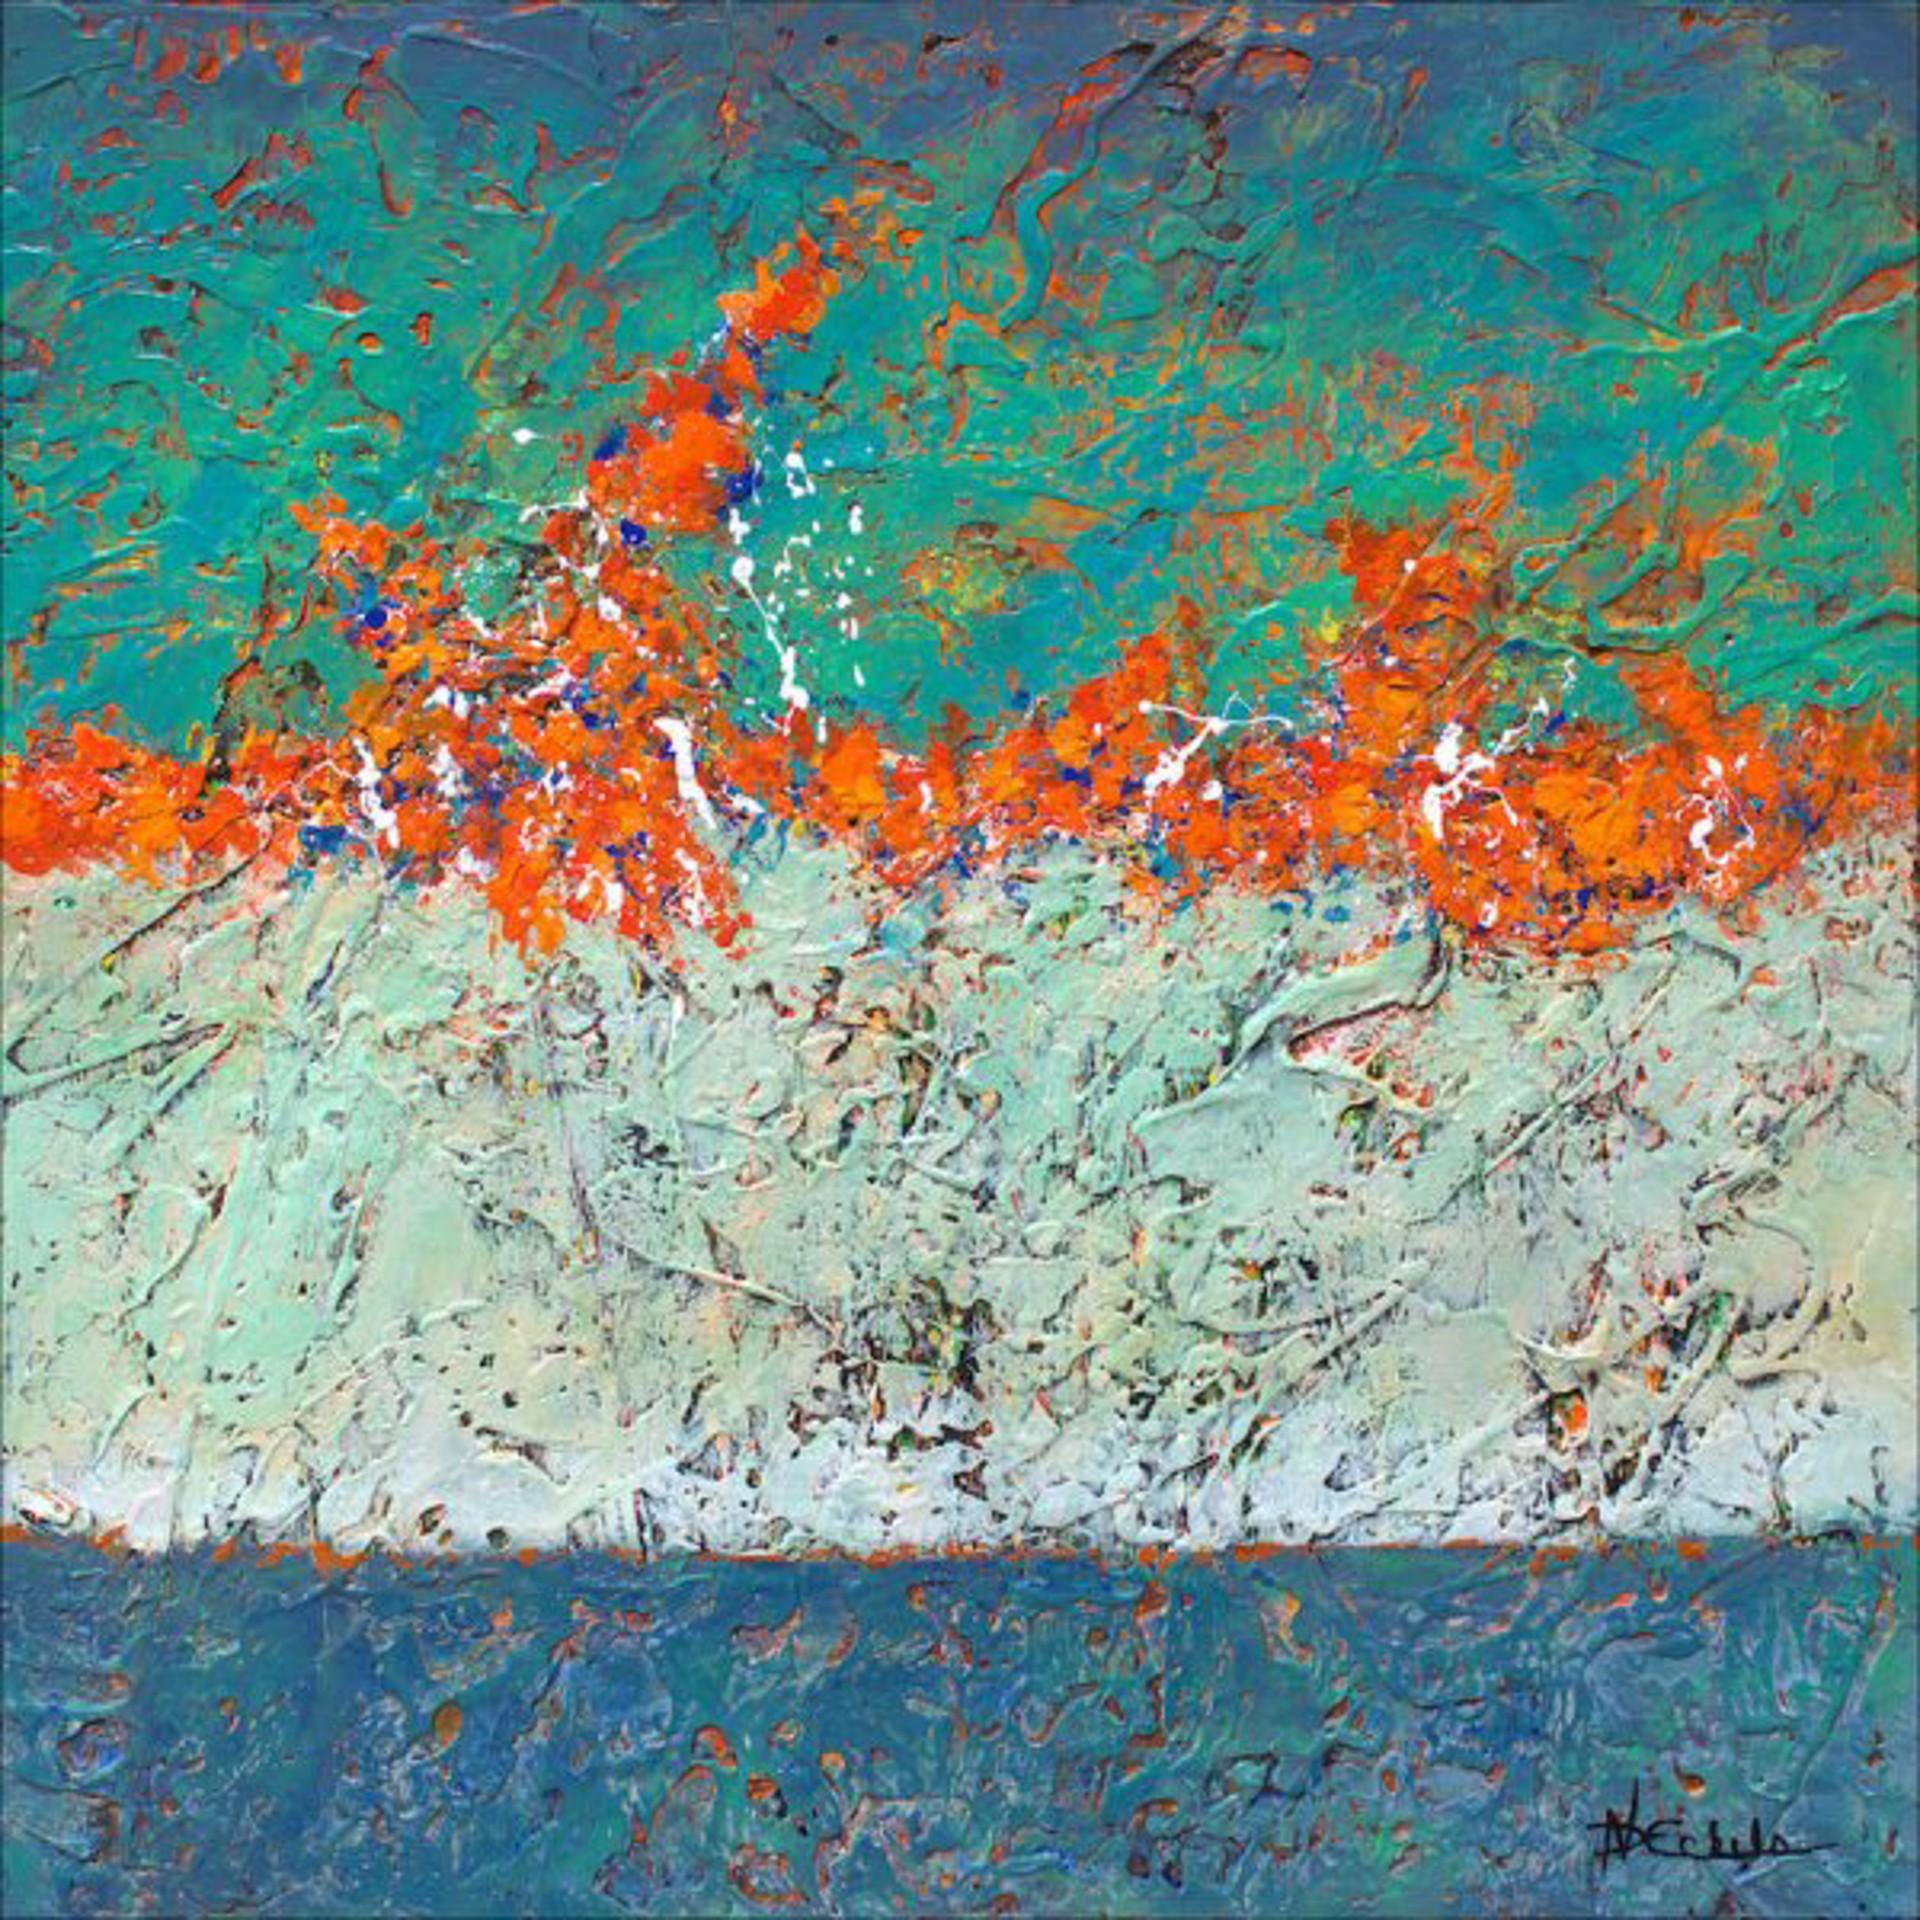 Stirred Up by Nancy Eckels